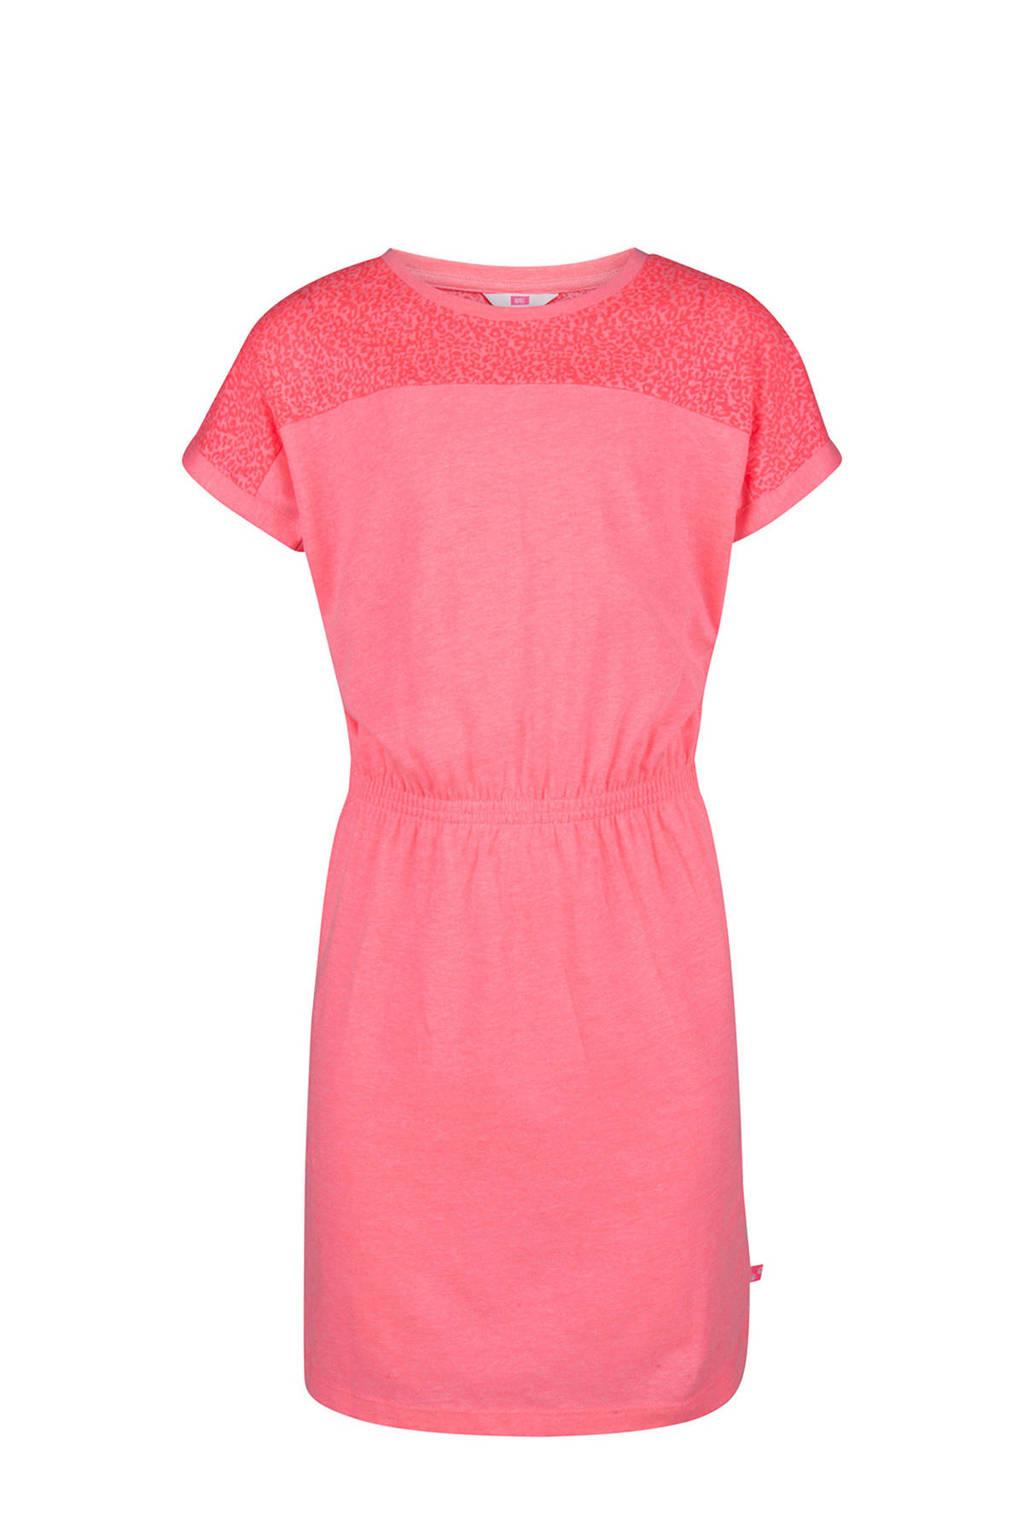 WE Fashion jurk met panterprint roze, Roze